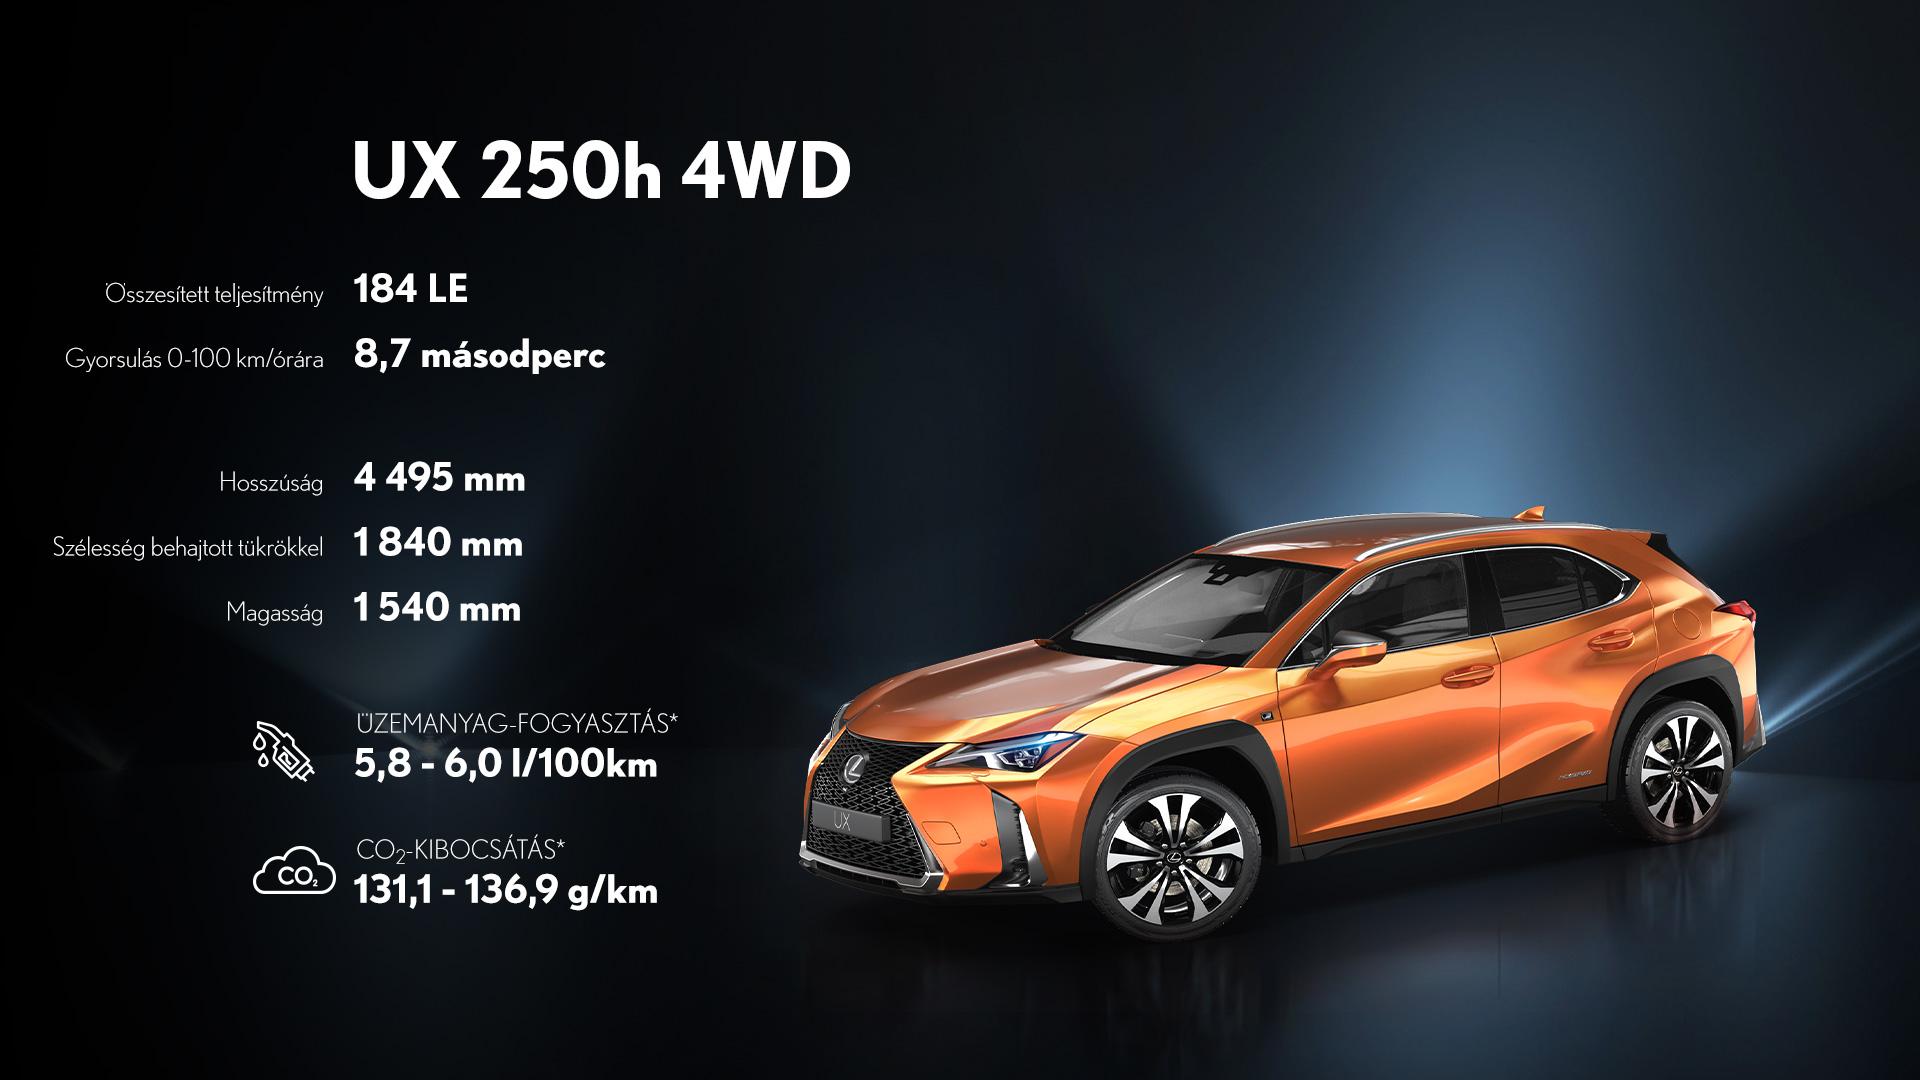 UX 250h 4wd